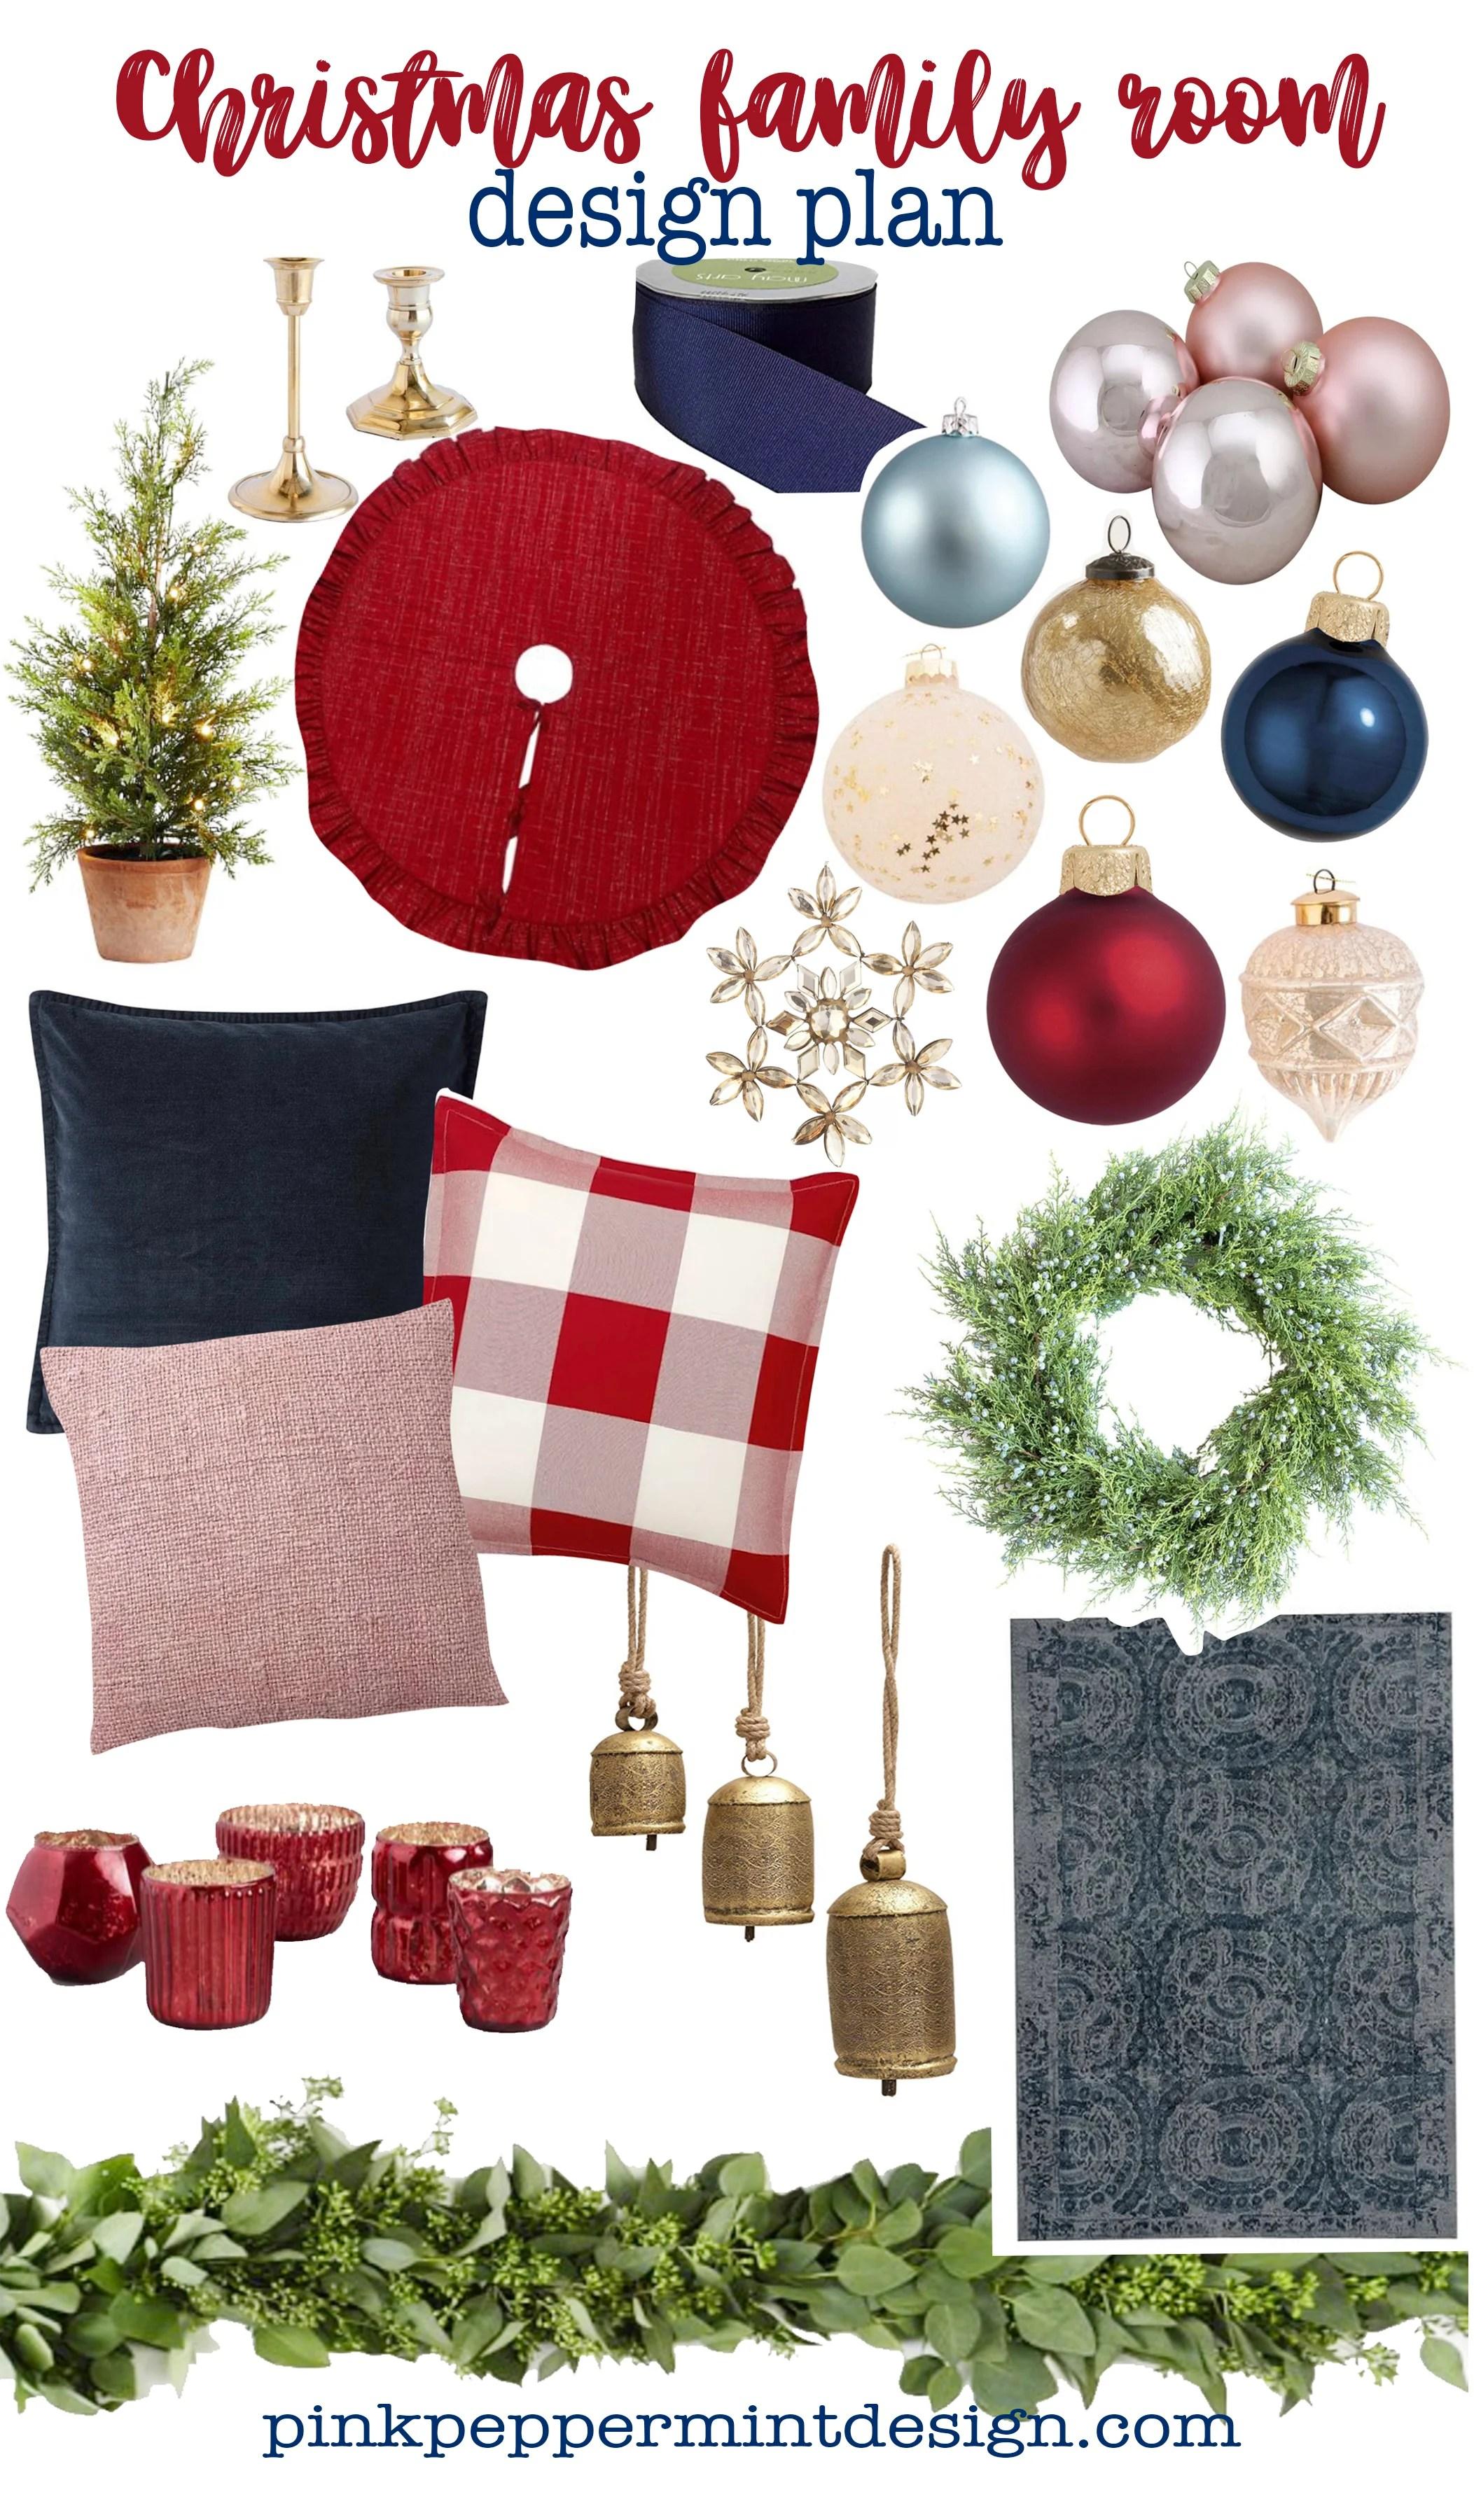 Christmas family room design plan